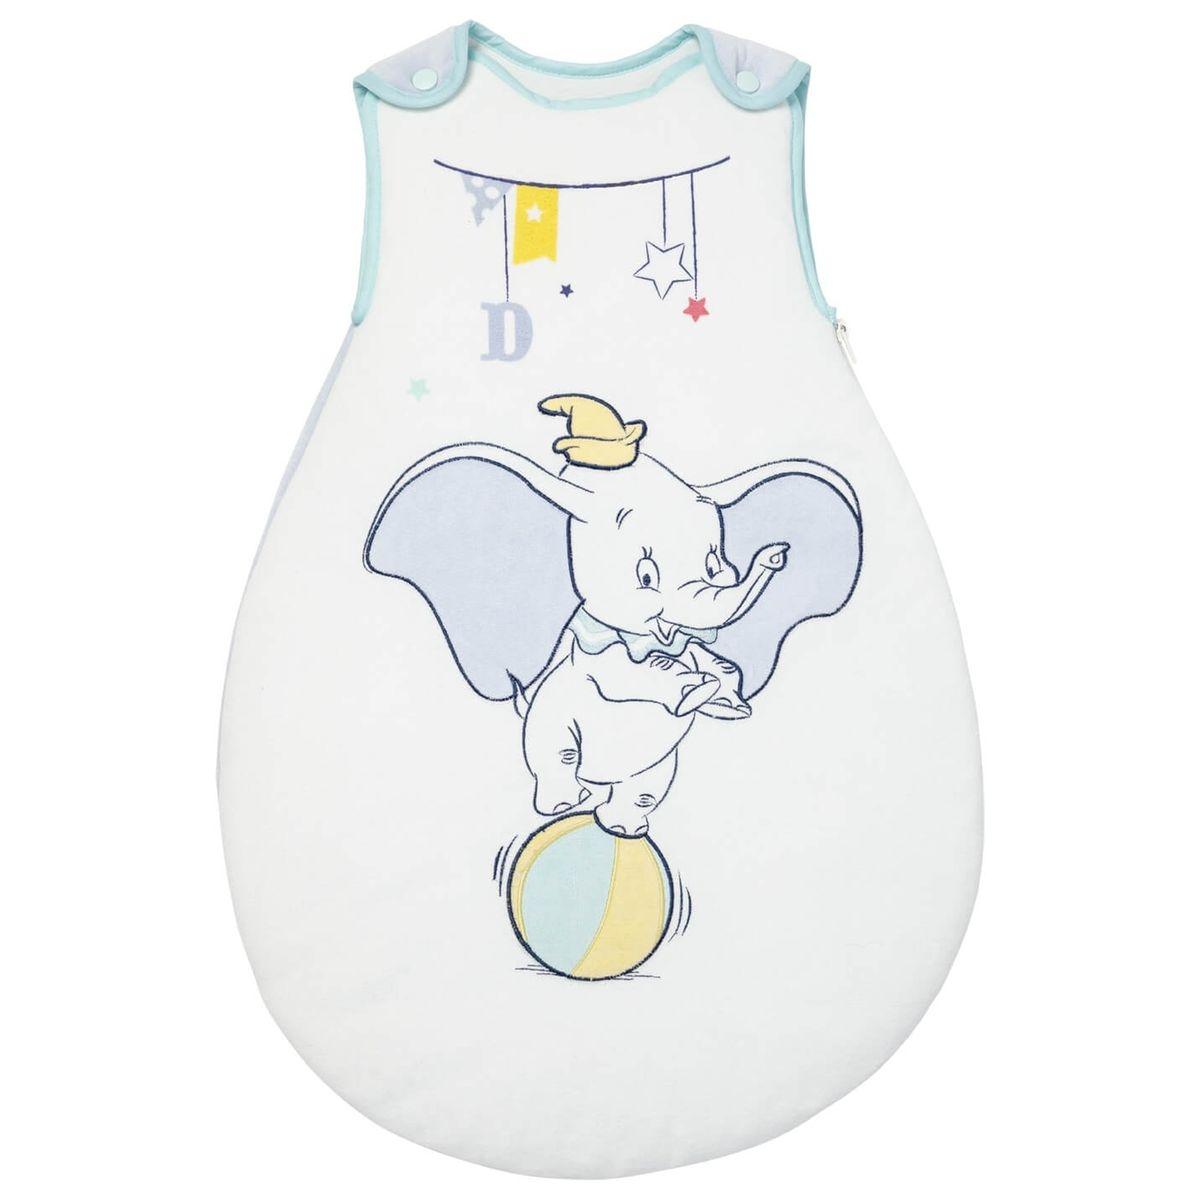 Gigoteuse 0-6 mois Dumbo